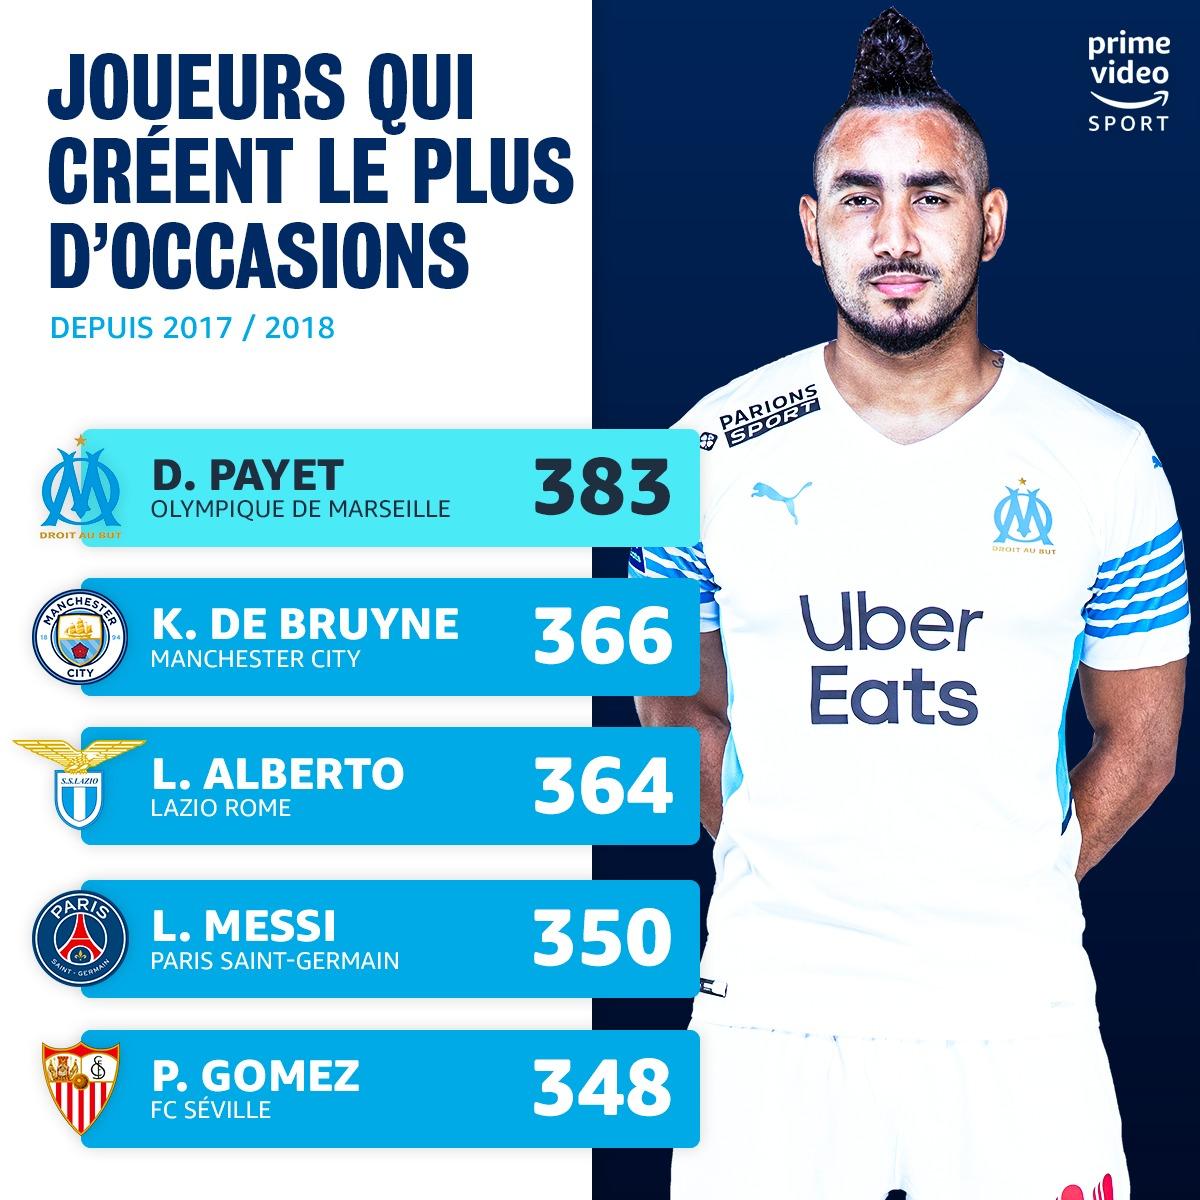 Dimitri Payet doit il revenir en Equipe de France  ? #PAYET #OM #UEL